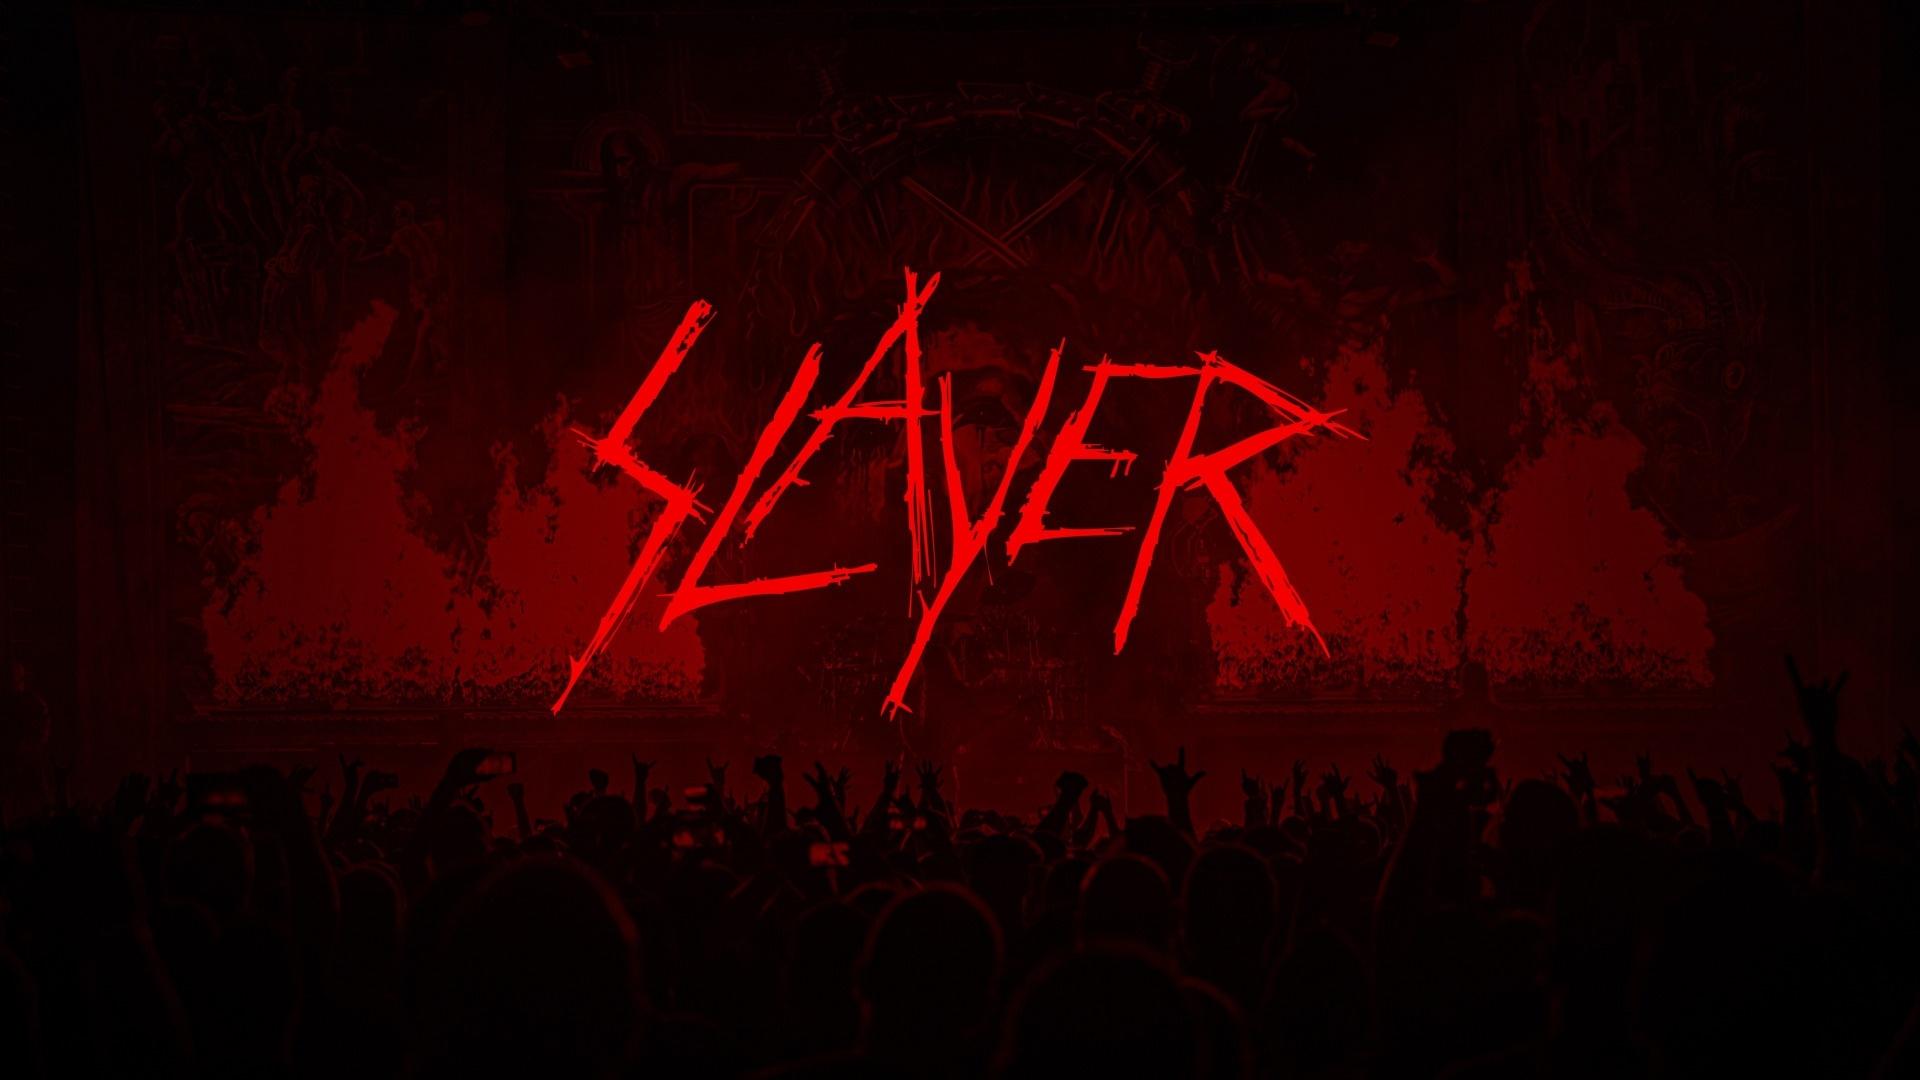 Slayer desktop wallpaper